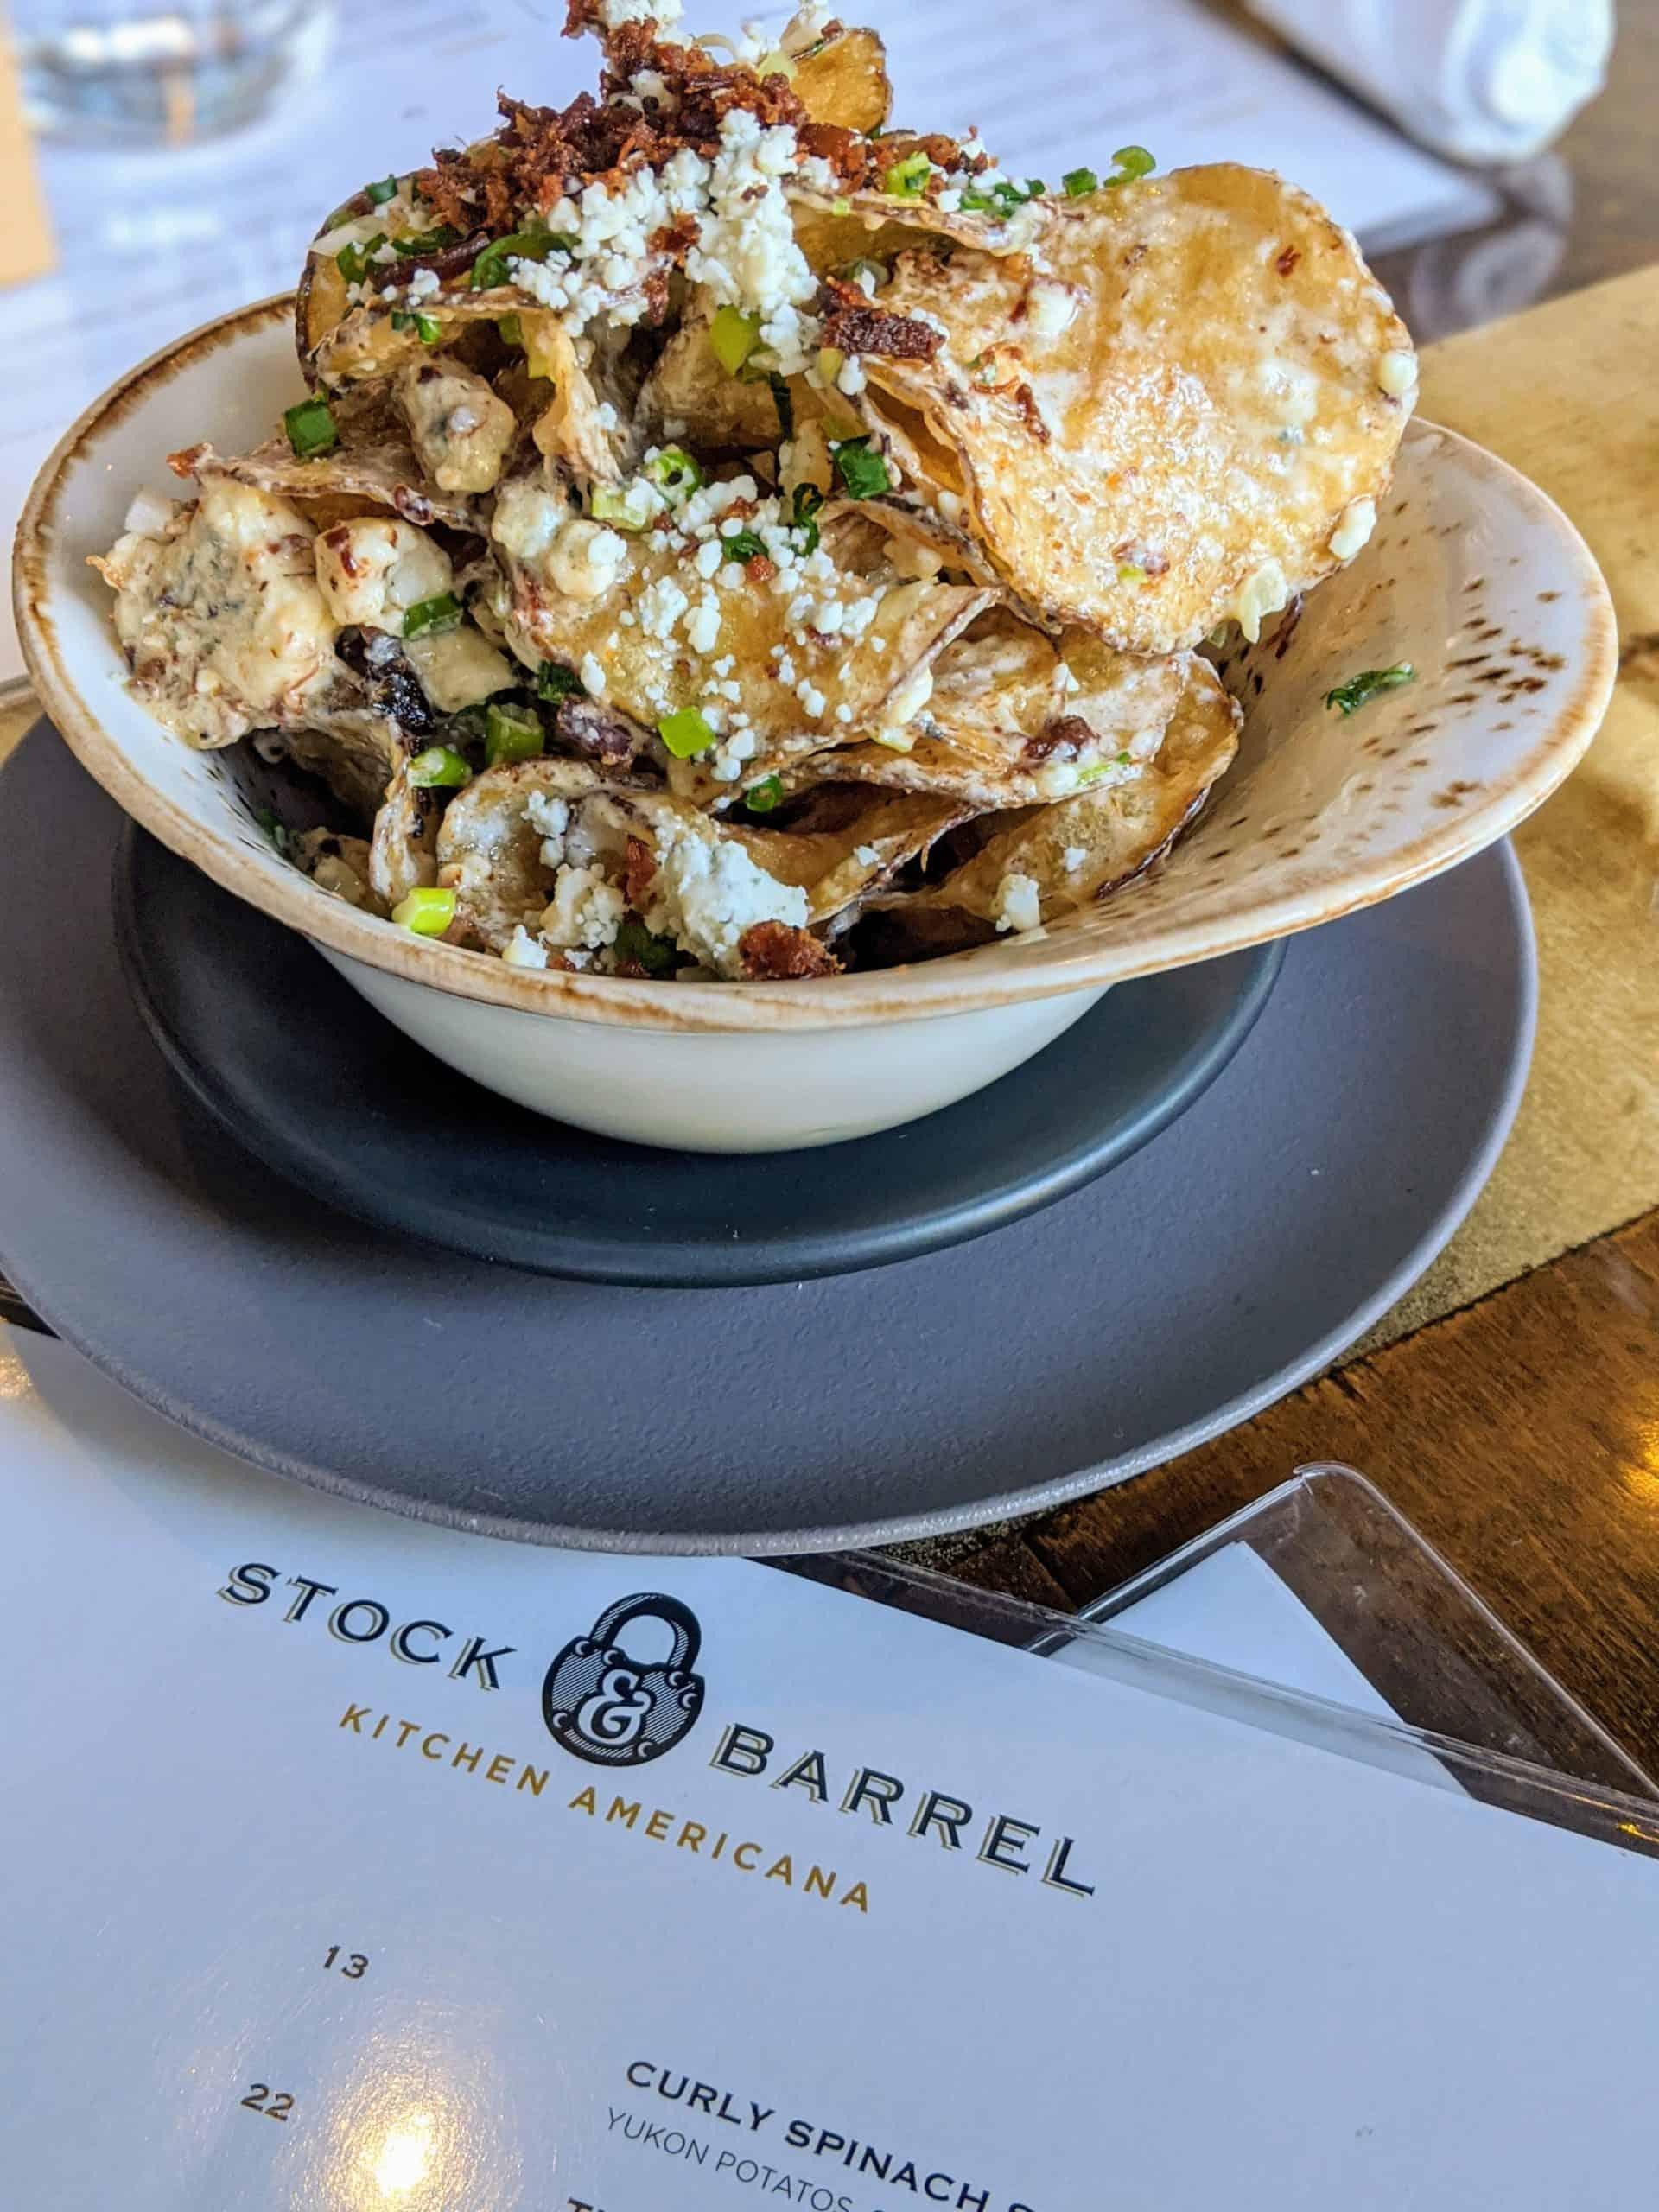 Brunch Review: Stock & Barrel